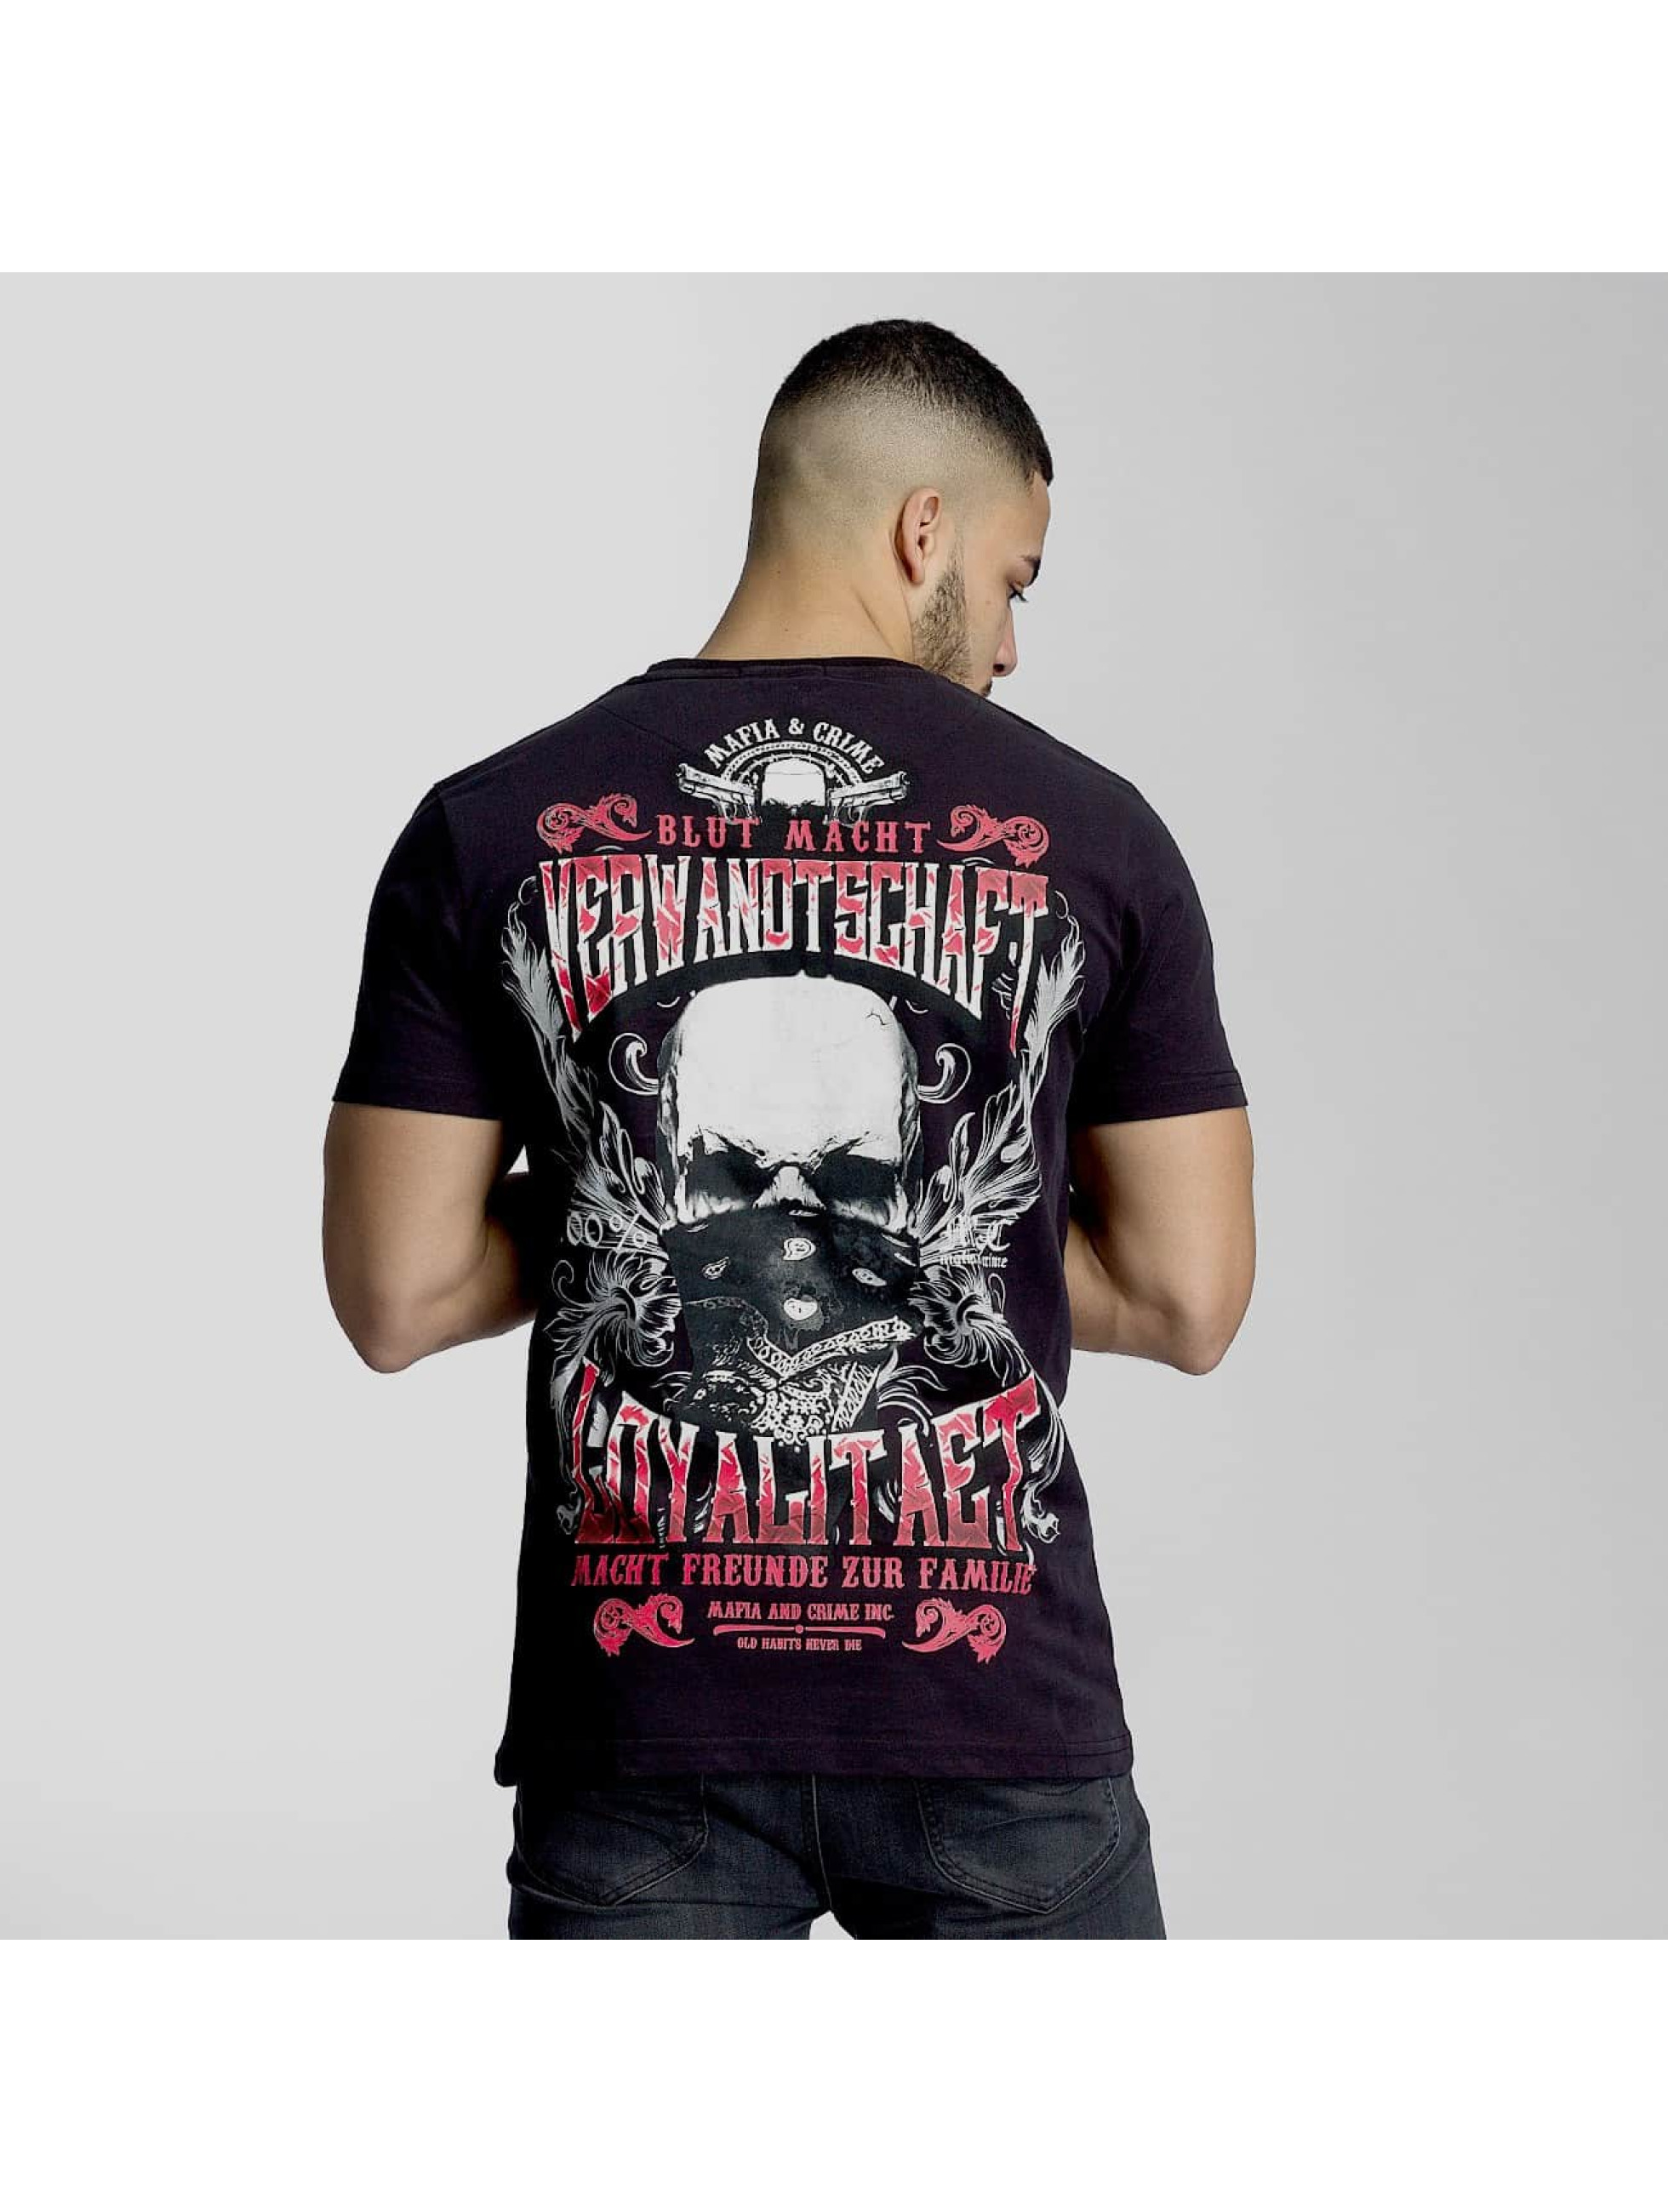 Mafia & Crime T-Shirt Familie black